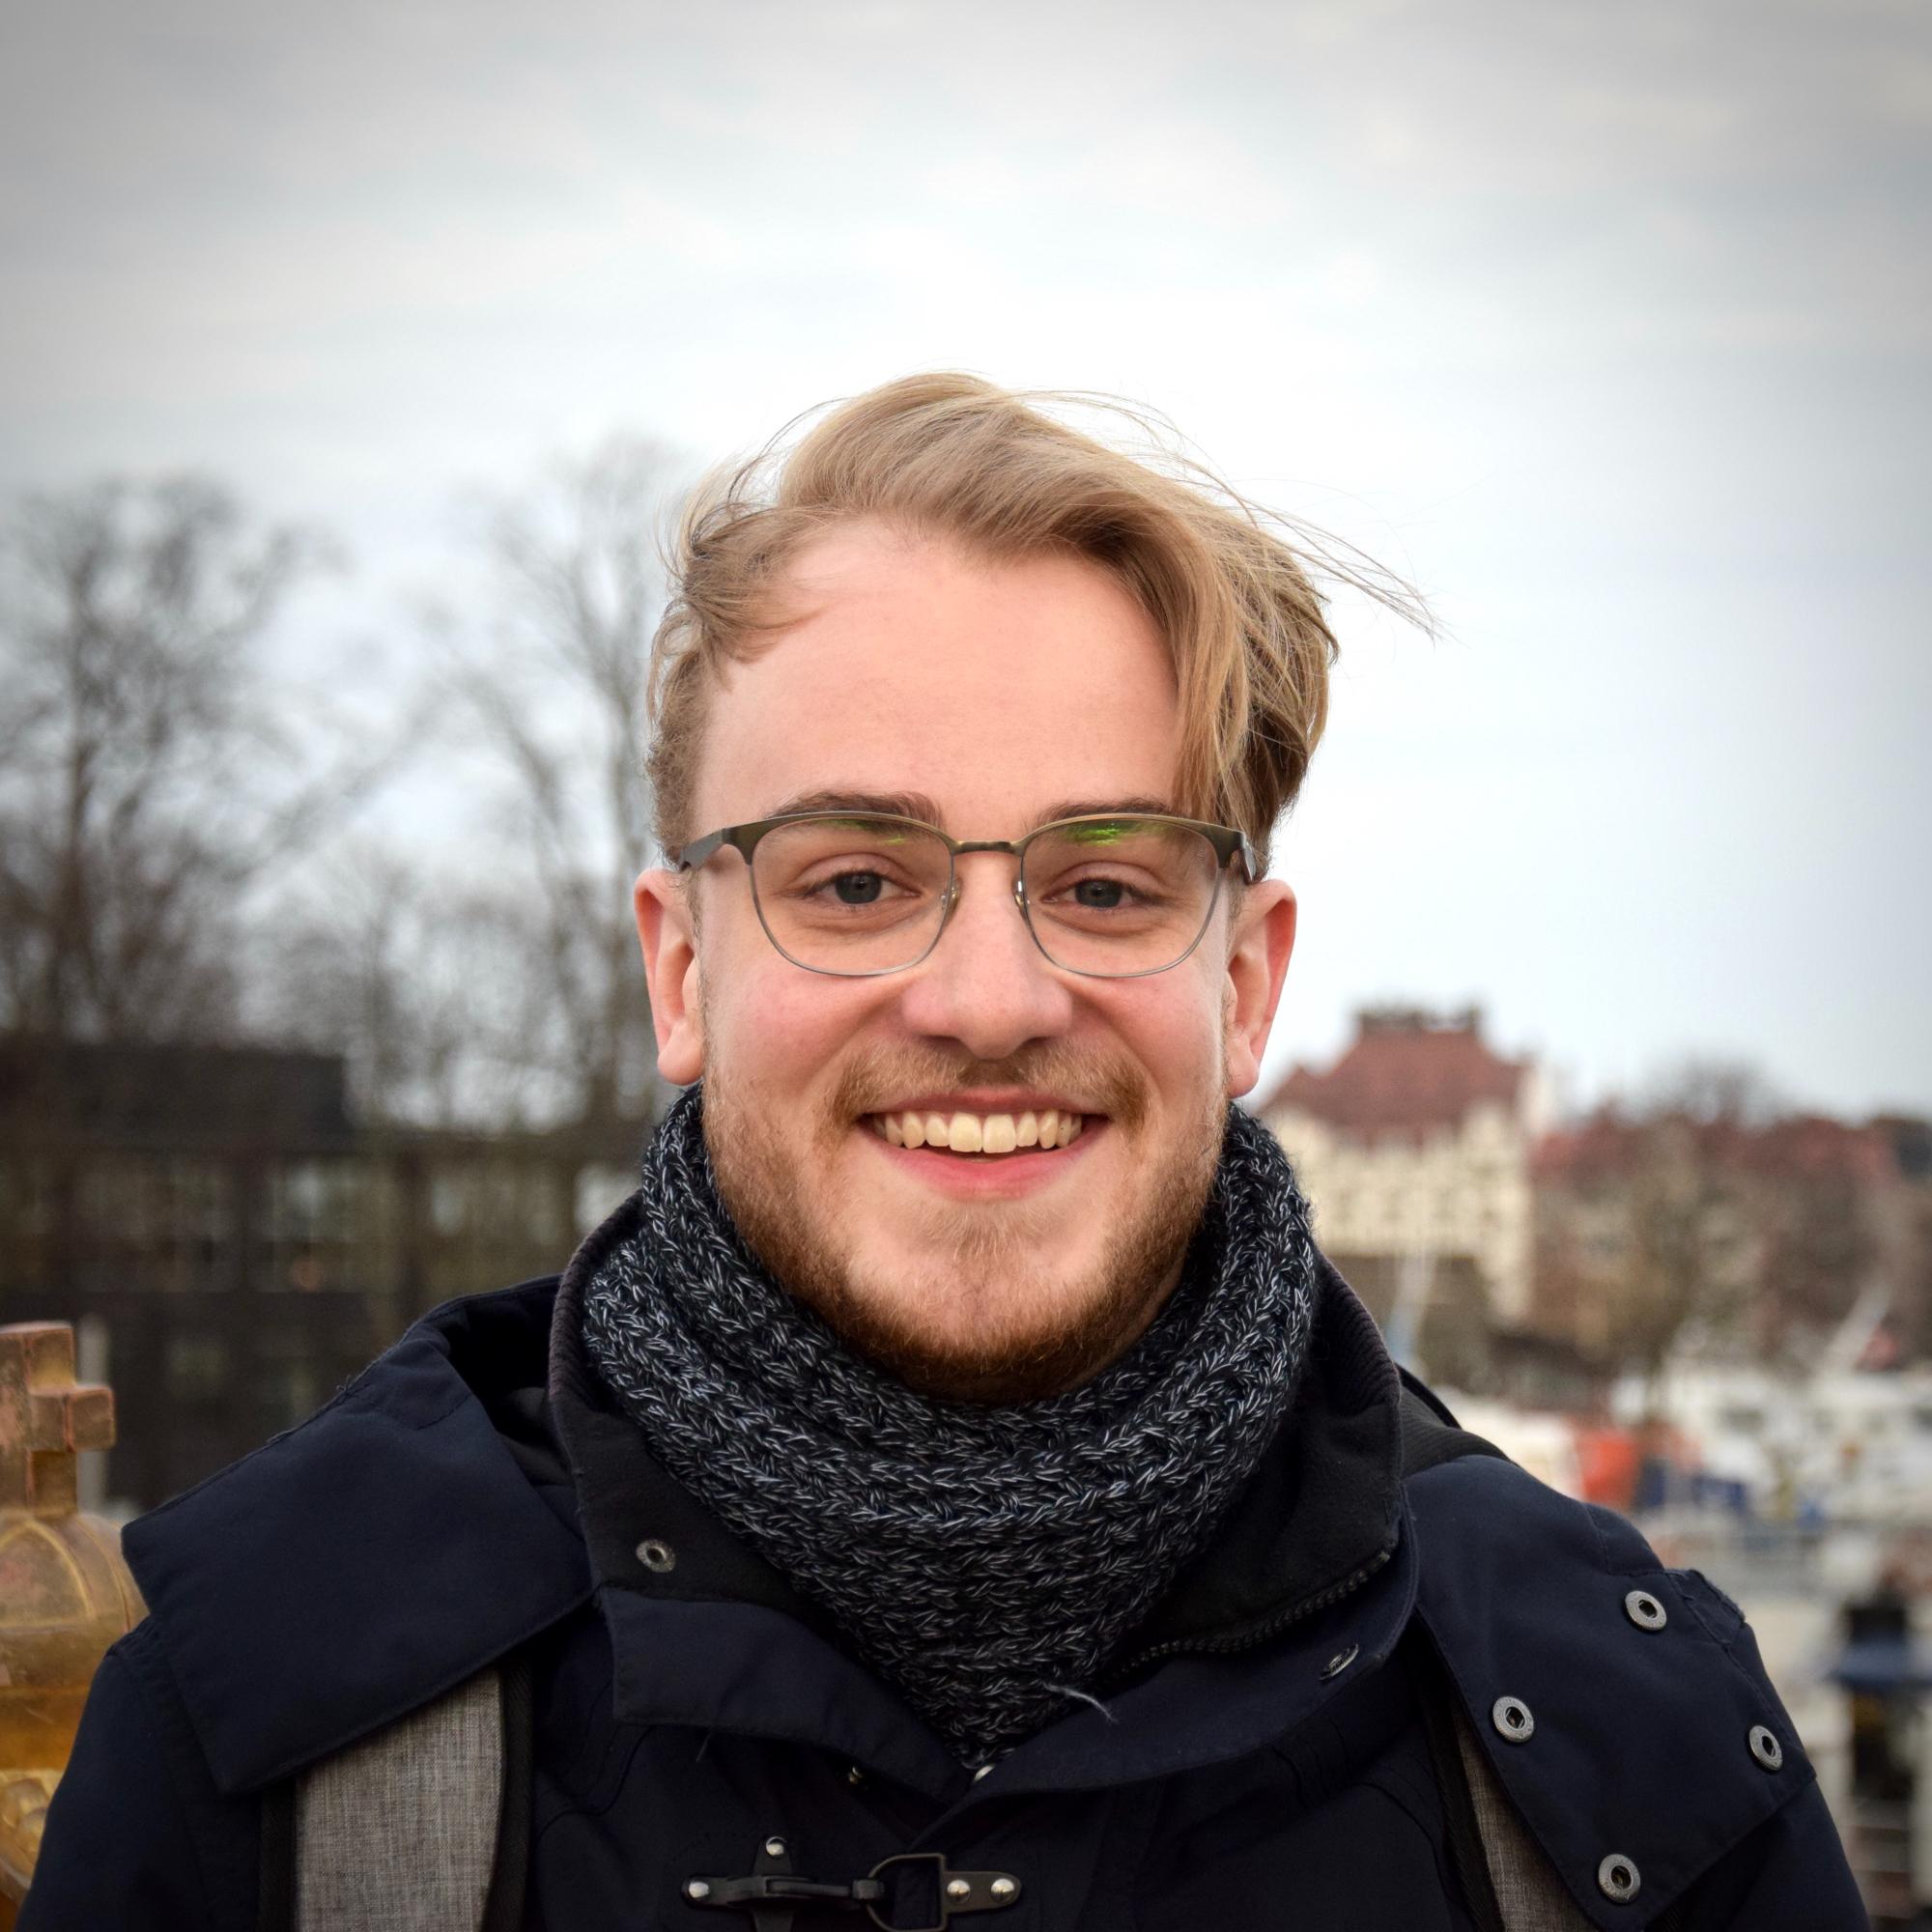 Image of Moritz Draschner